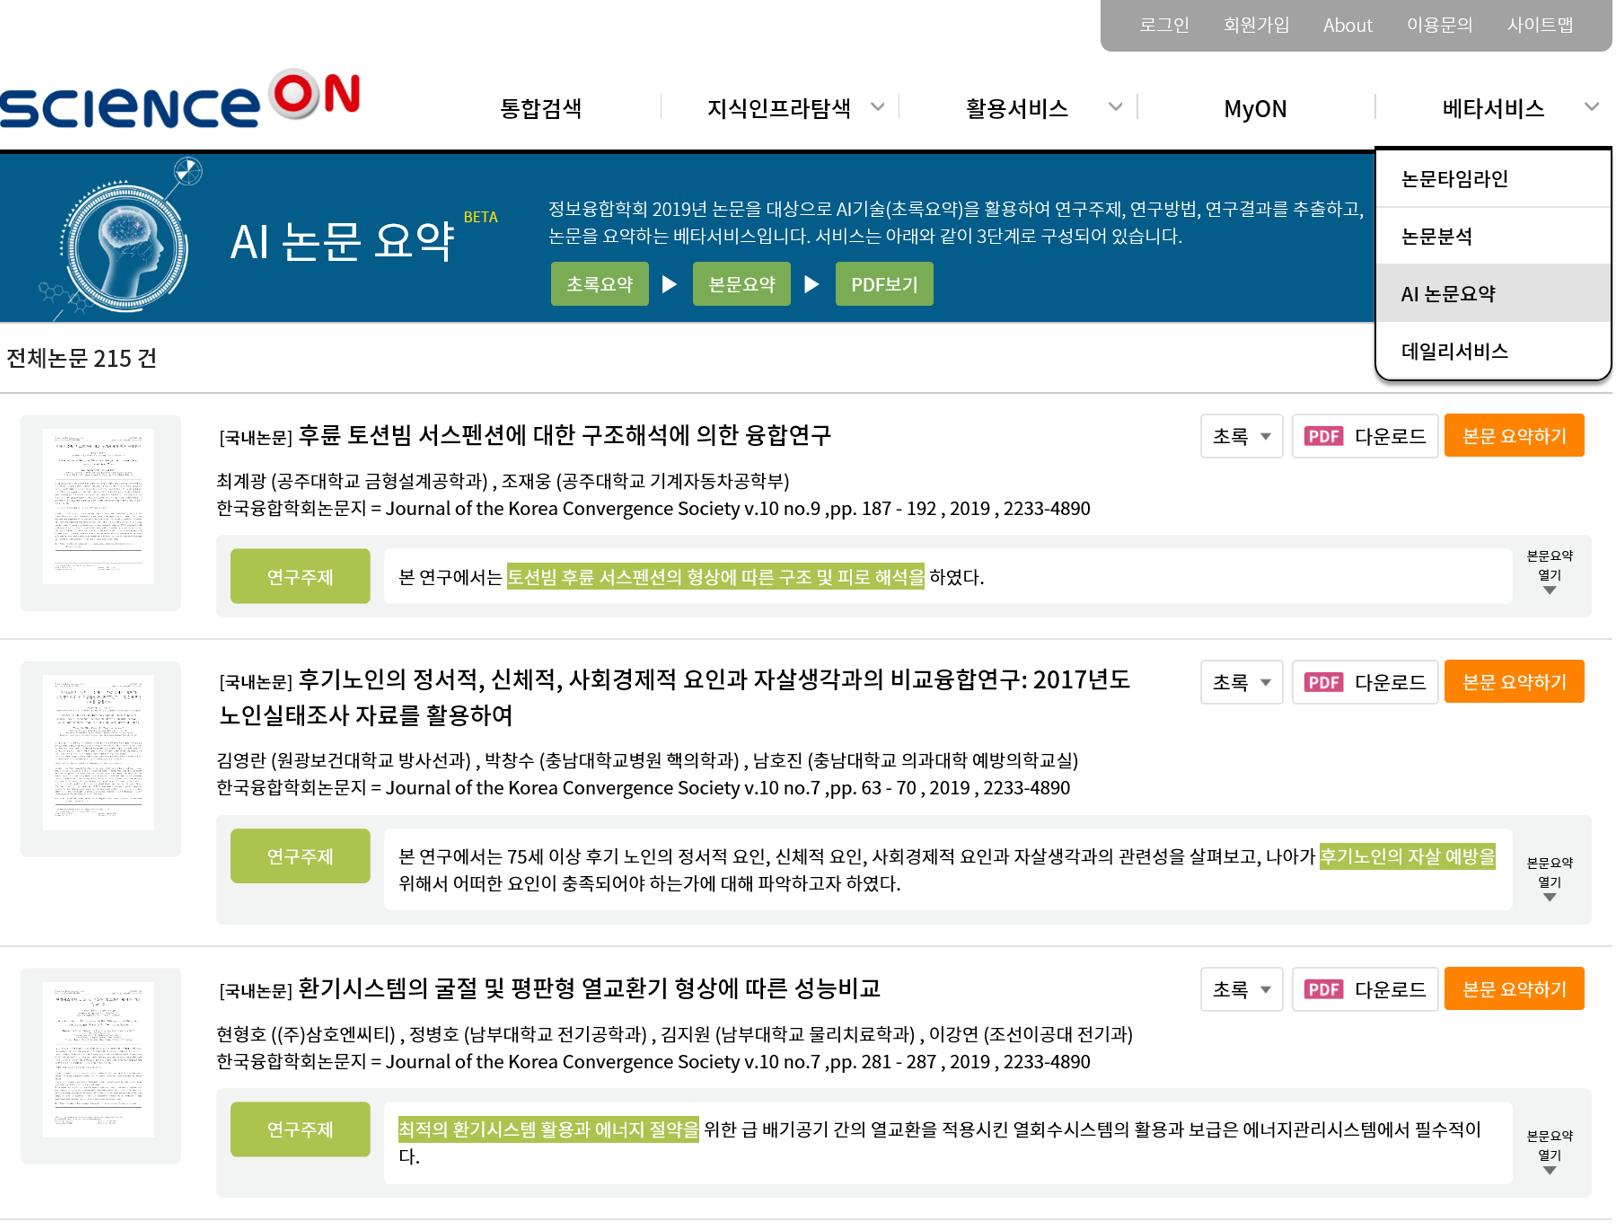 ScienceON 홈페이지의 AI 논문 요약 서비스 화면